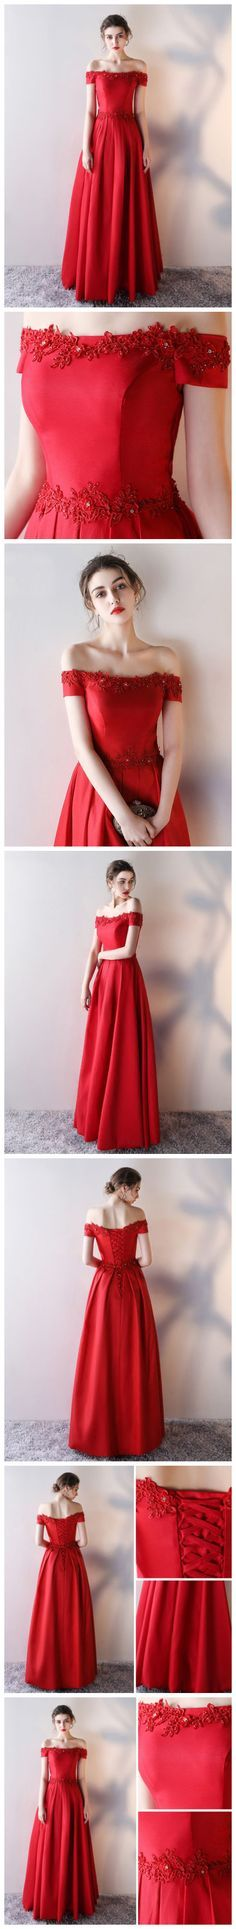 CHIC A-LINE RED OFF-THE-SHOULDER APPLIQUE MODEST PROM DRESS EVENING DRESS AM642 #amyprom #fashion #party #evening #chic #promdress #promdresslong #longpromdress #eveningdress #red